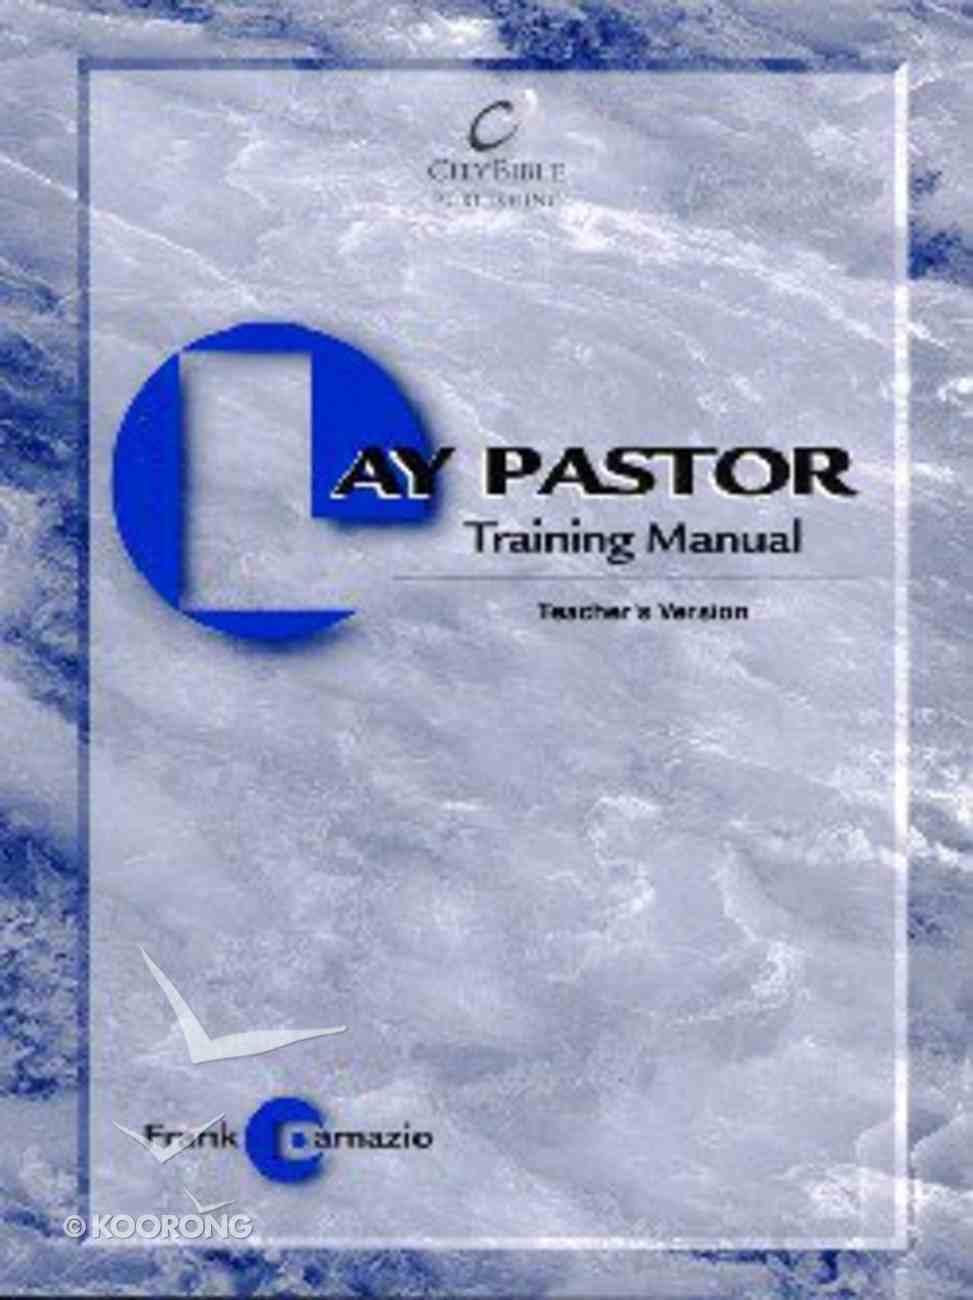 Lay Pastor Training Manual (Teacher's Guide) Paperback